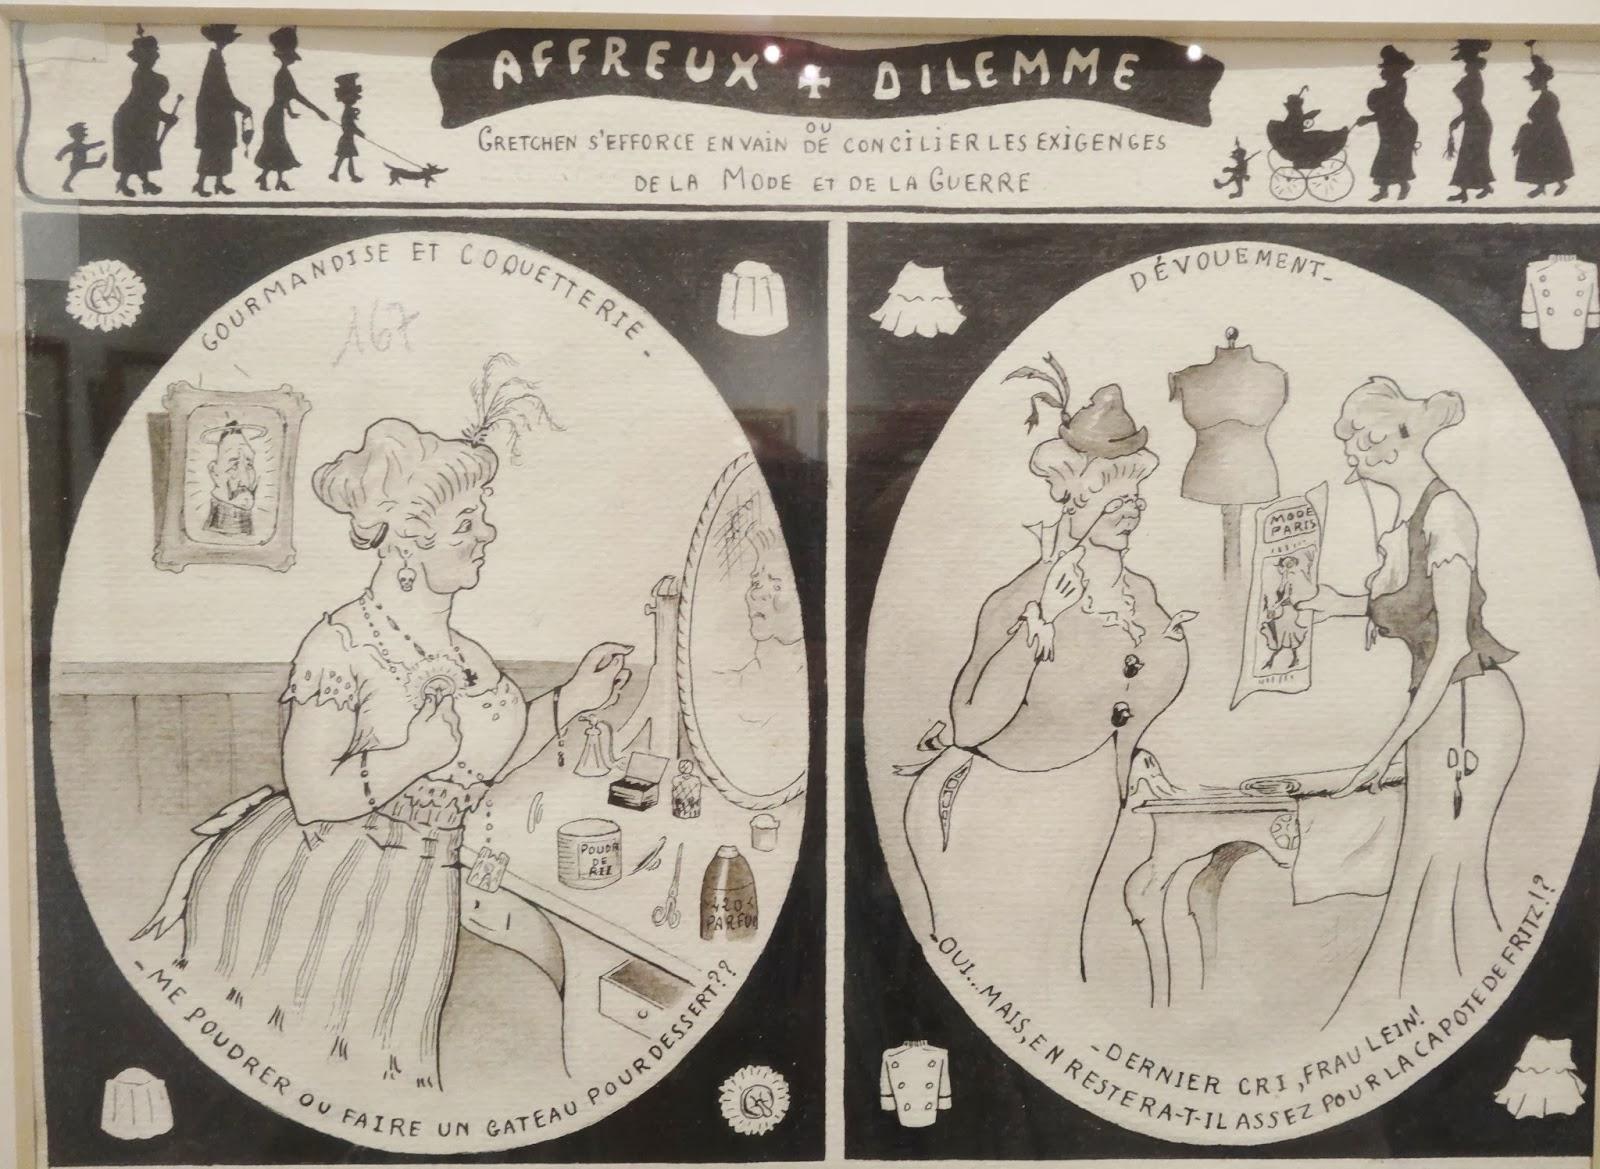 Jean+Moulin+-+Affreux+Dilemme.JPG